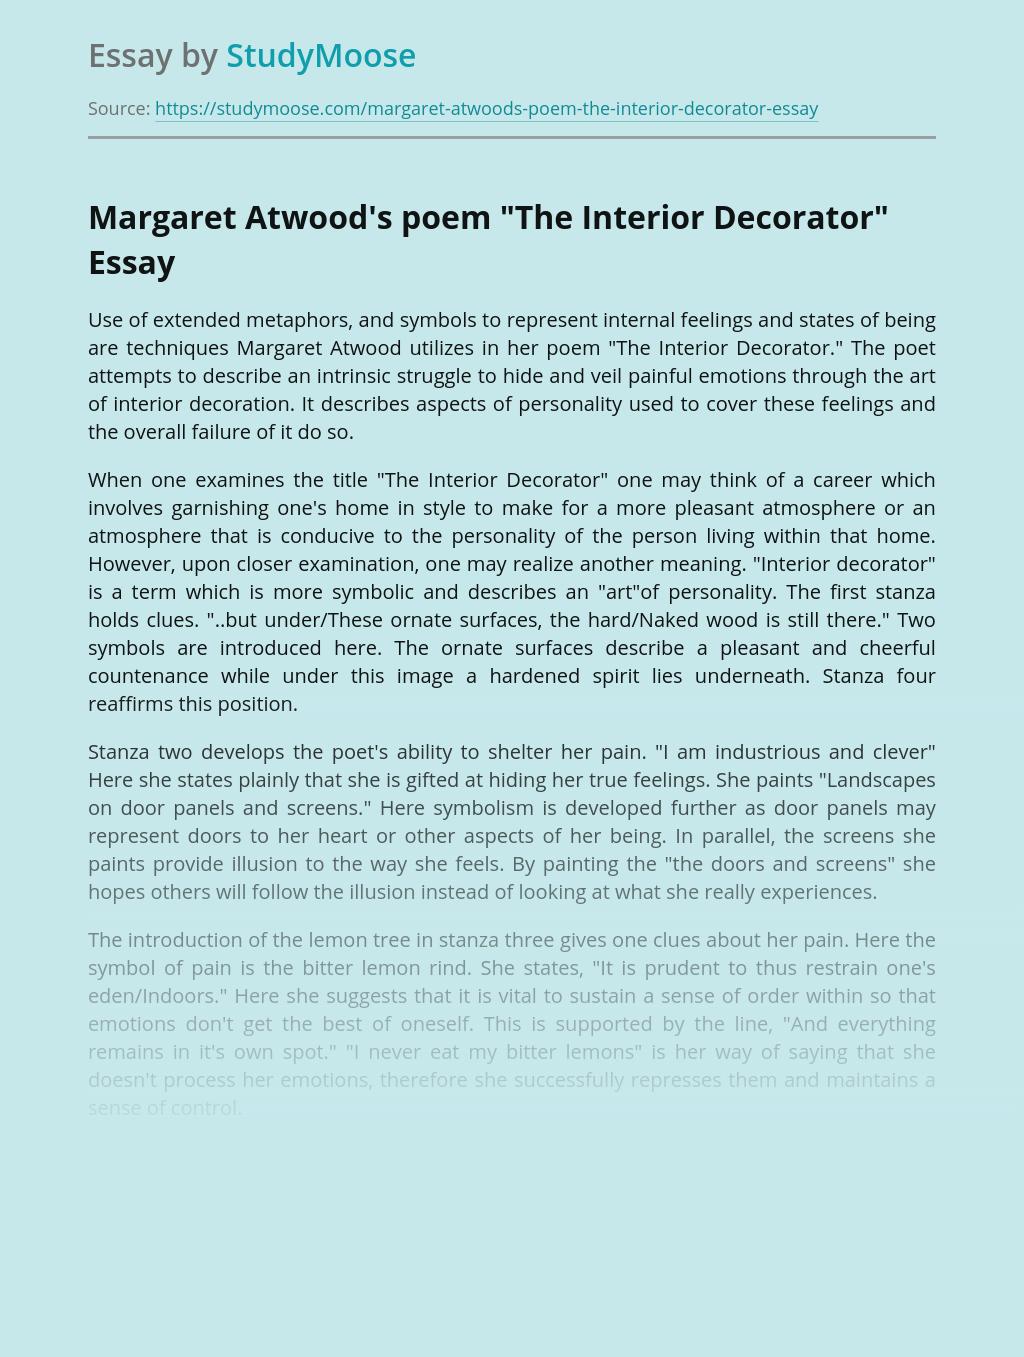 Margaret Atwood's poem